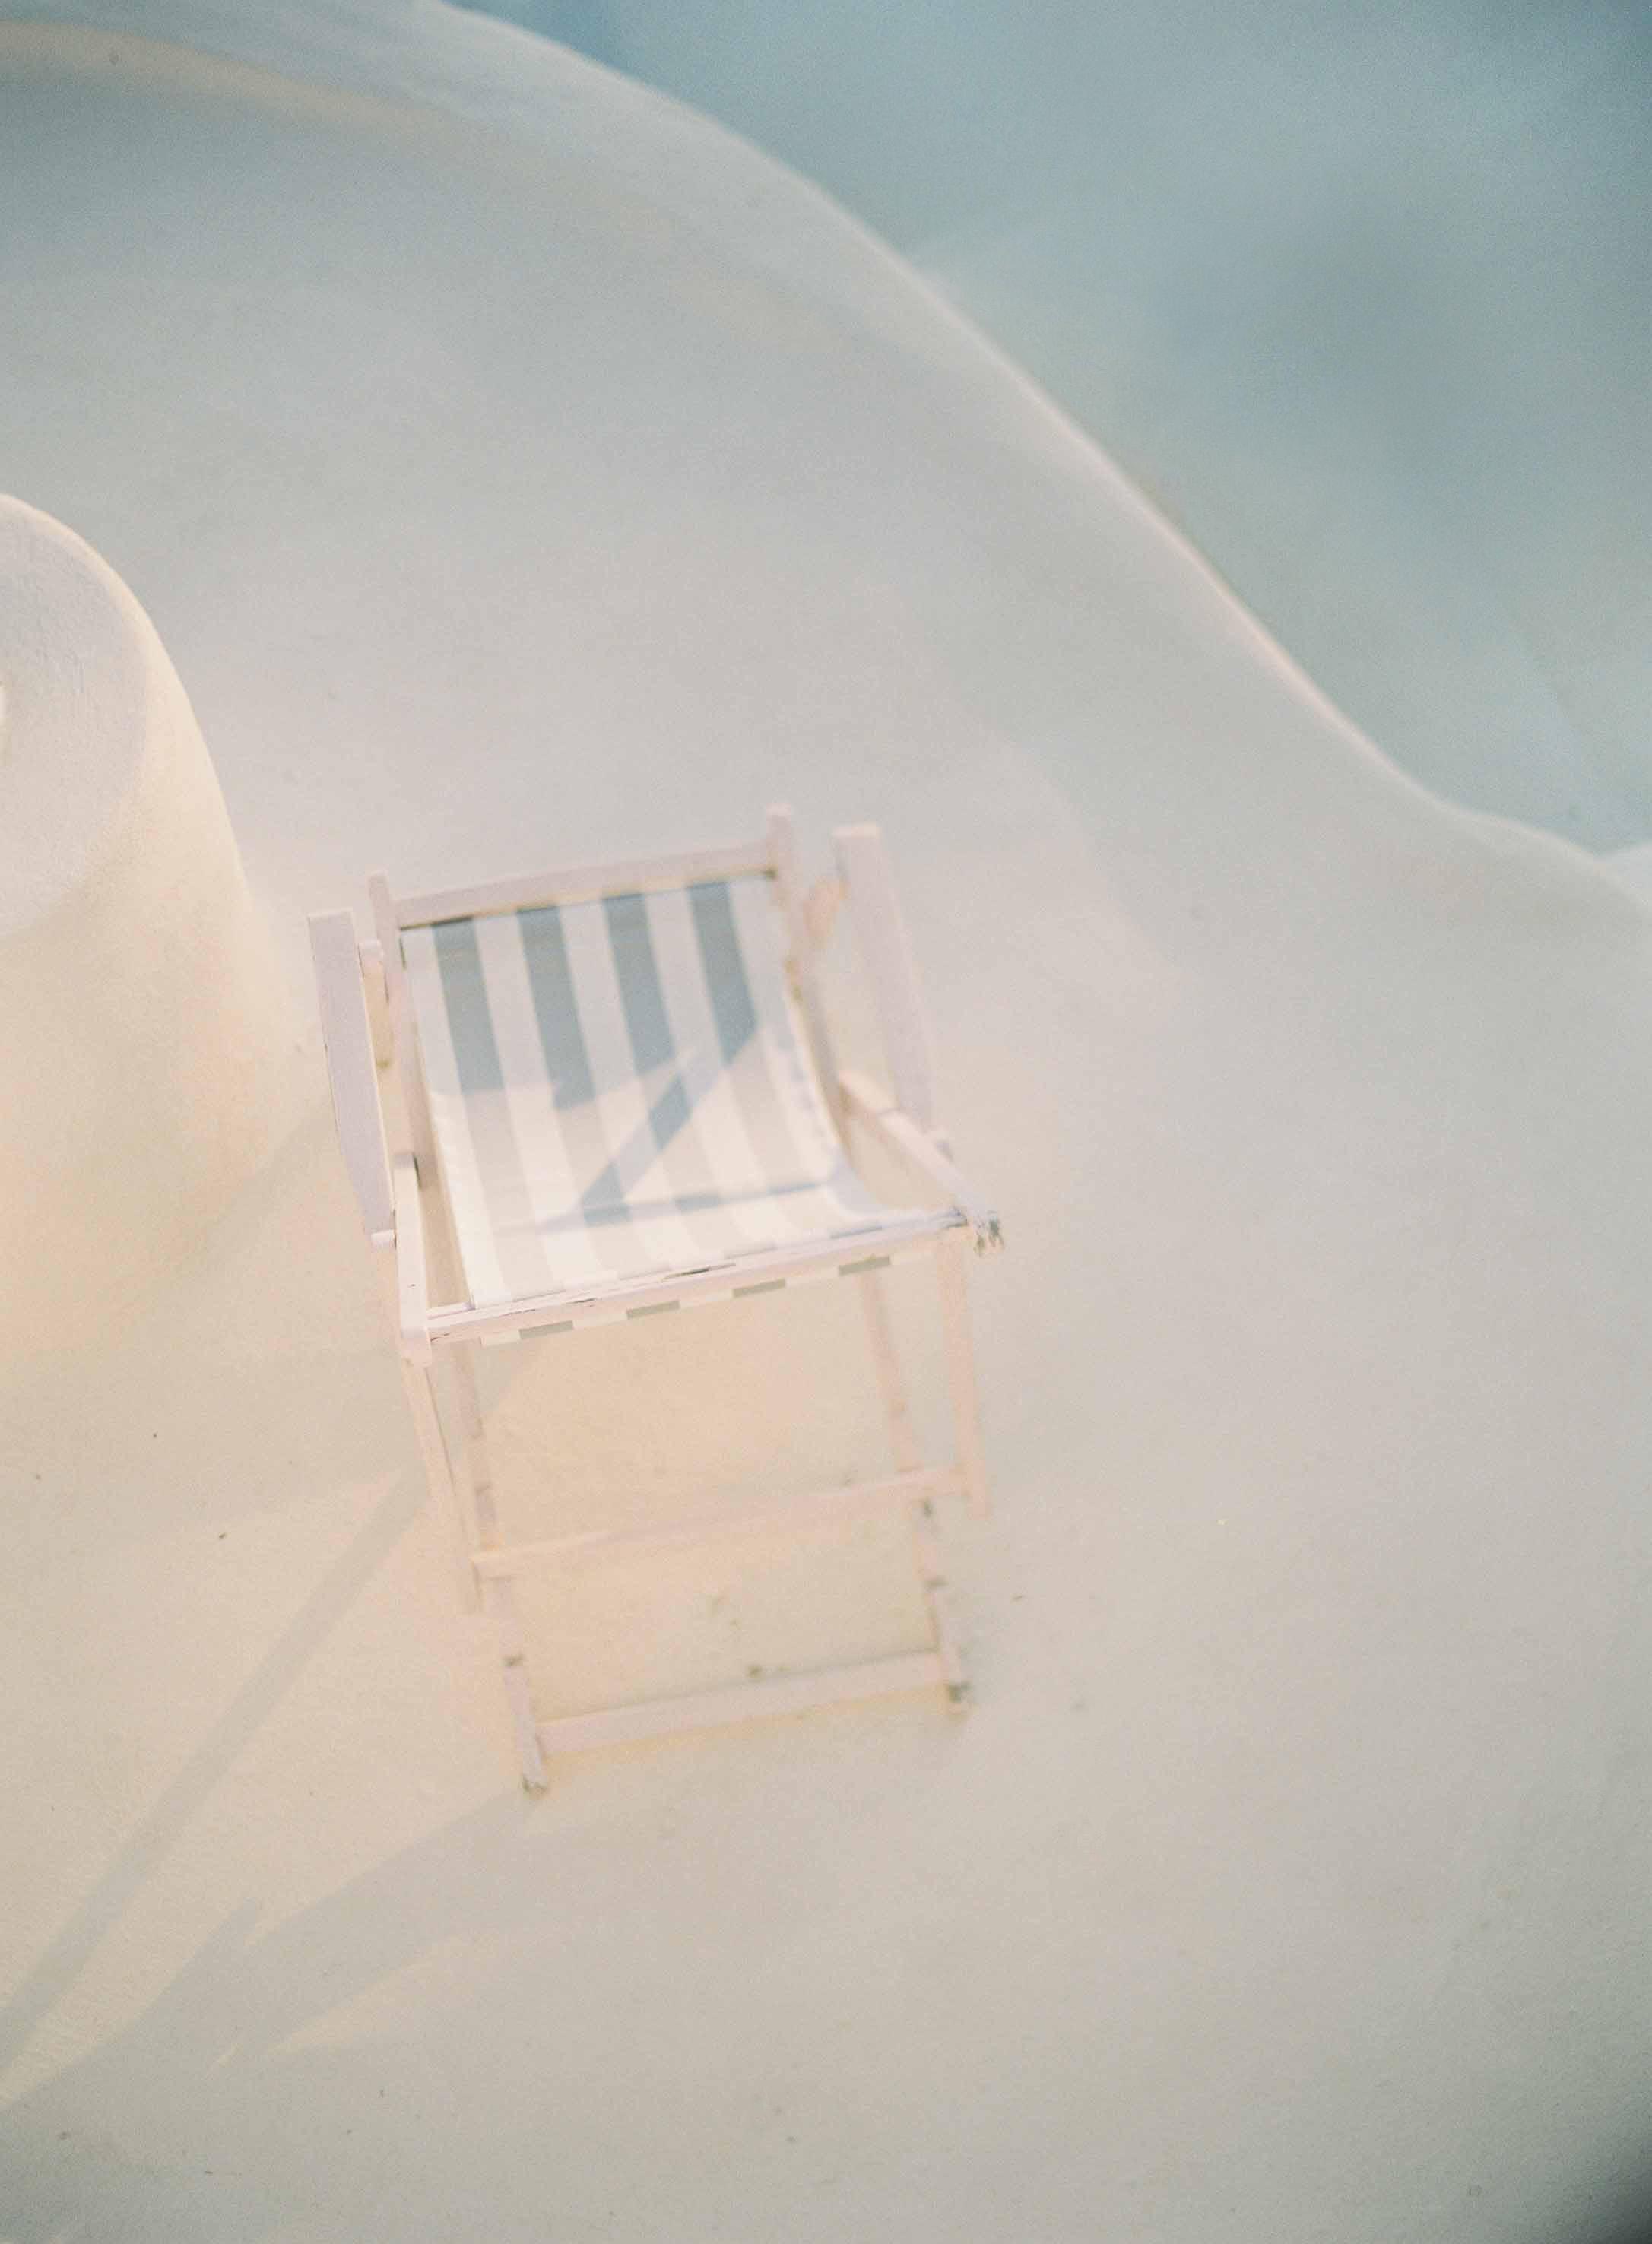 Santorini-Wedding-Photography-Jen-Huang5-007964-R1-002.jpg